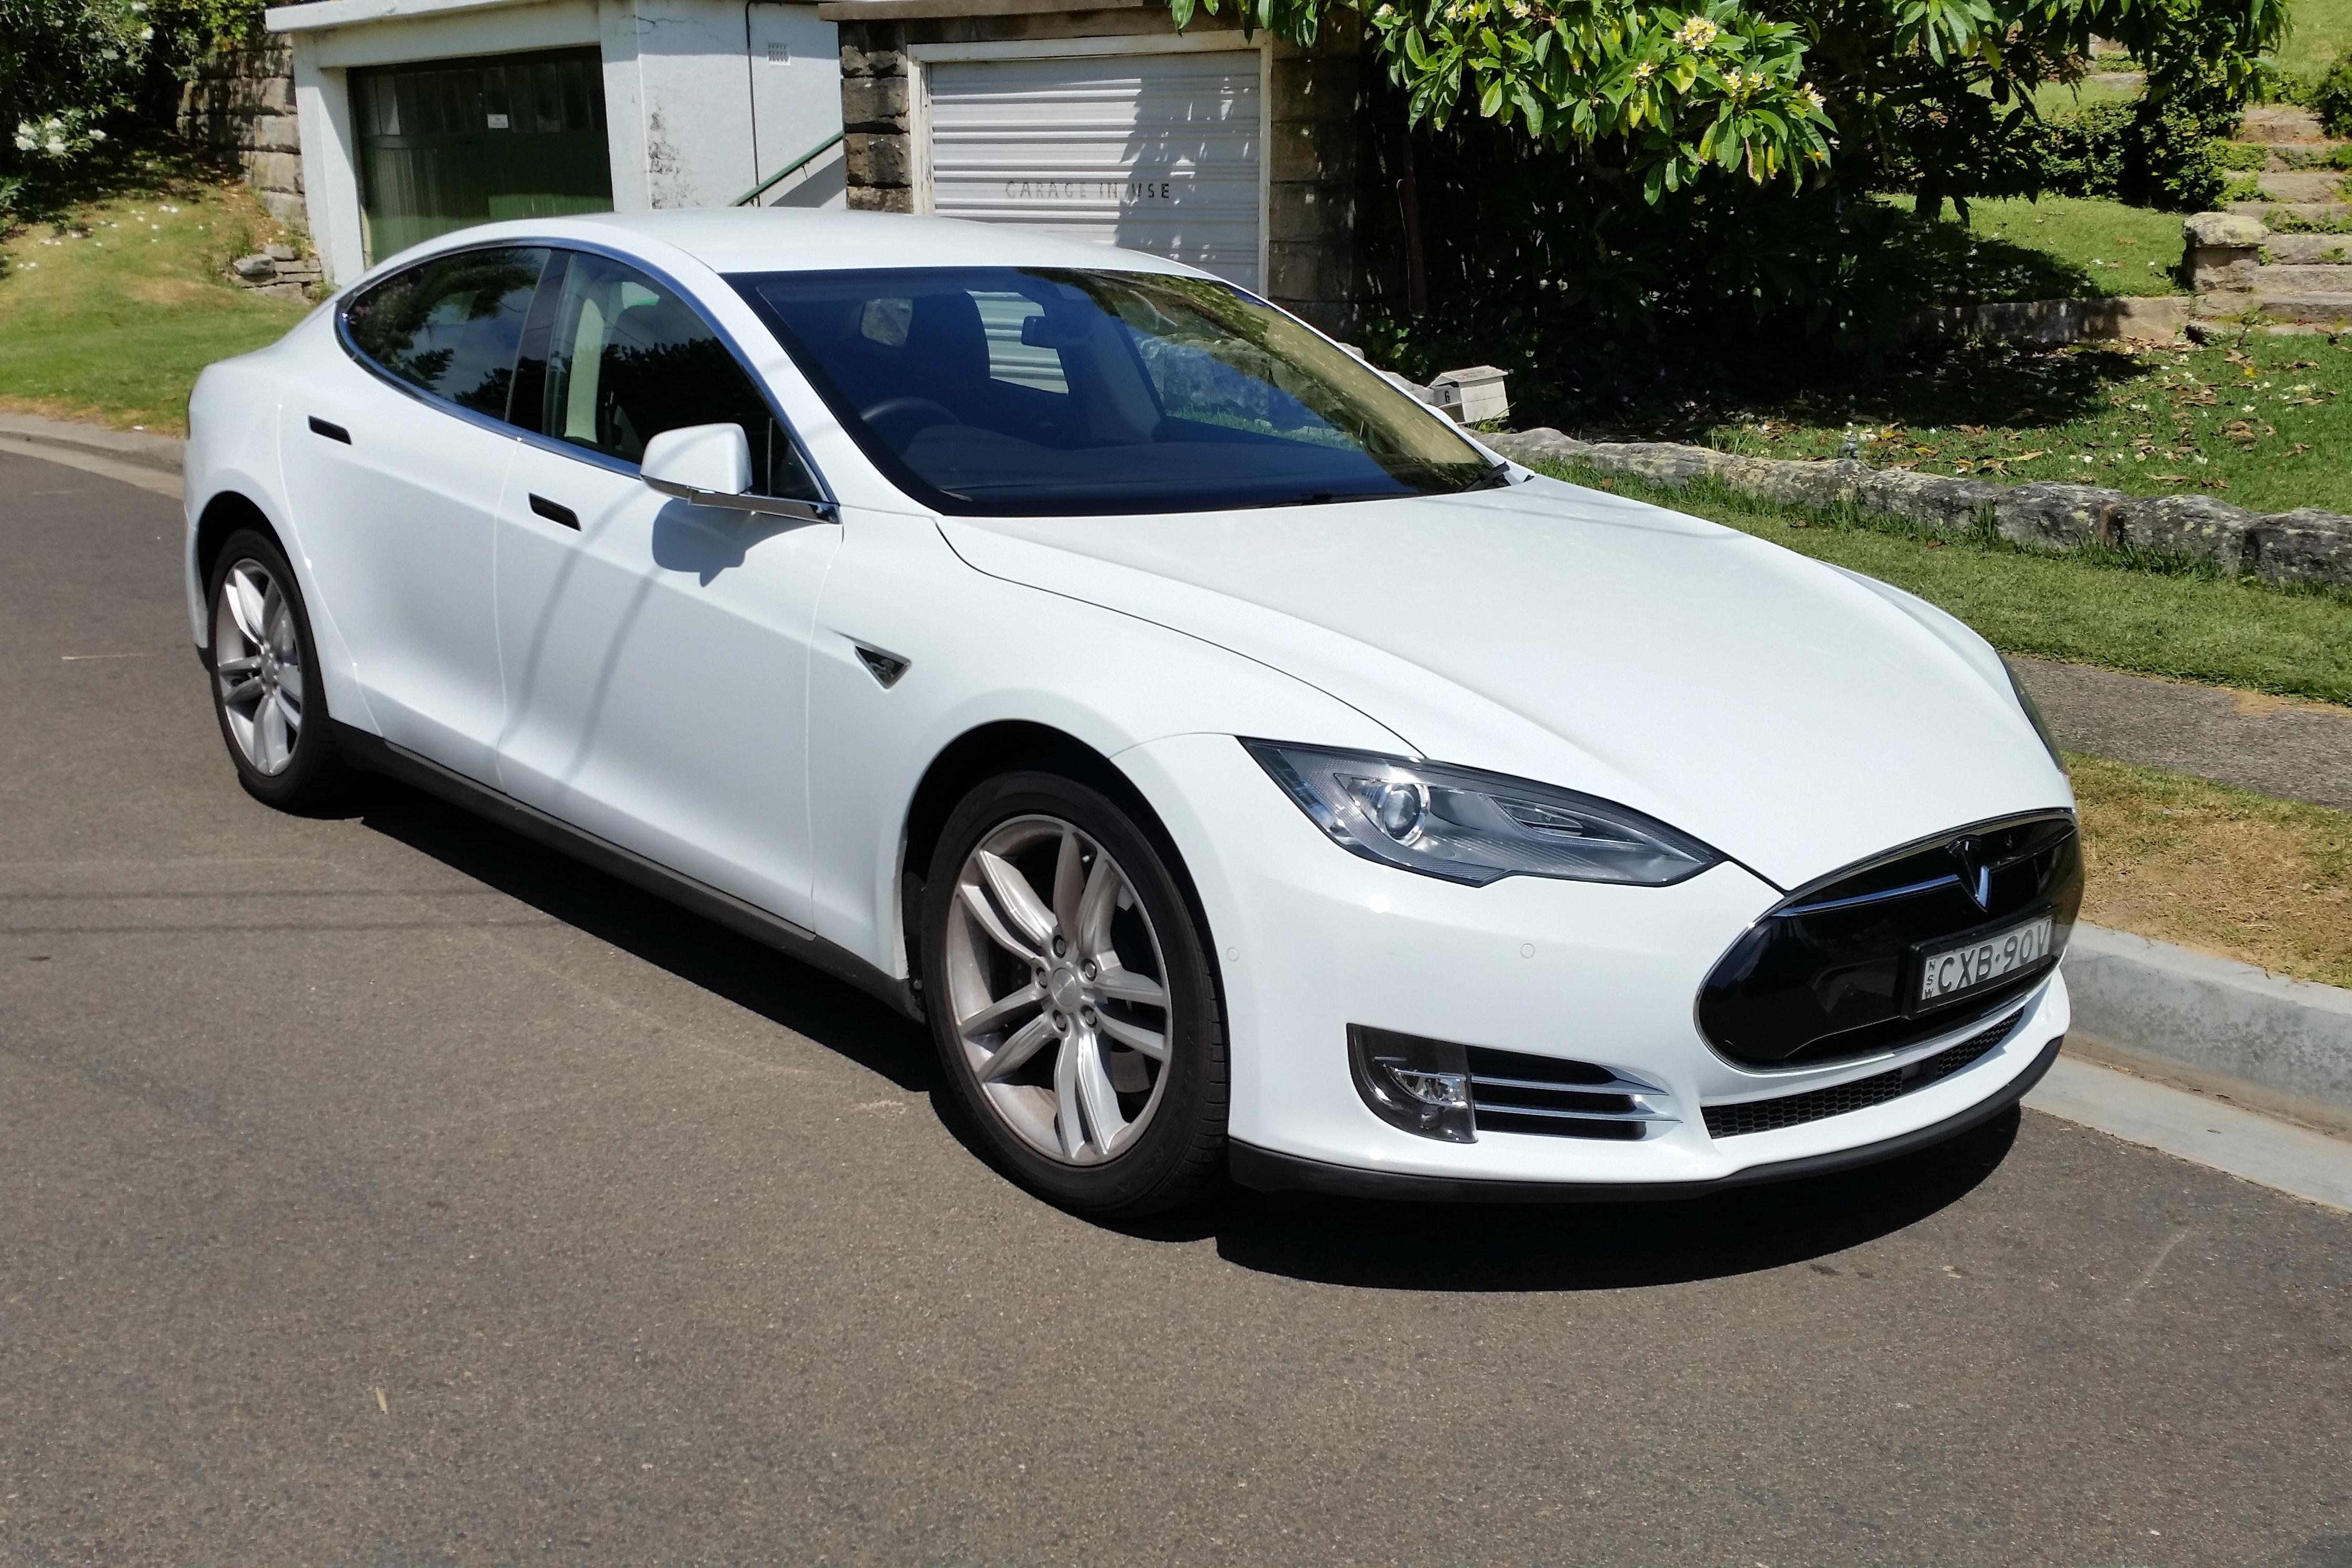 Tesla Model S Battery Electric Car